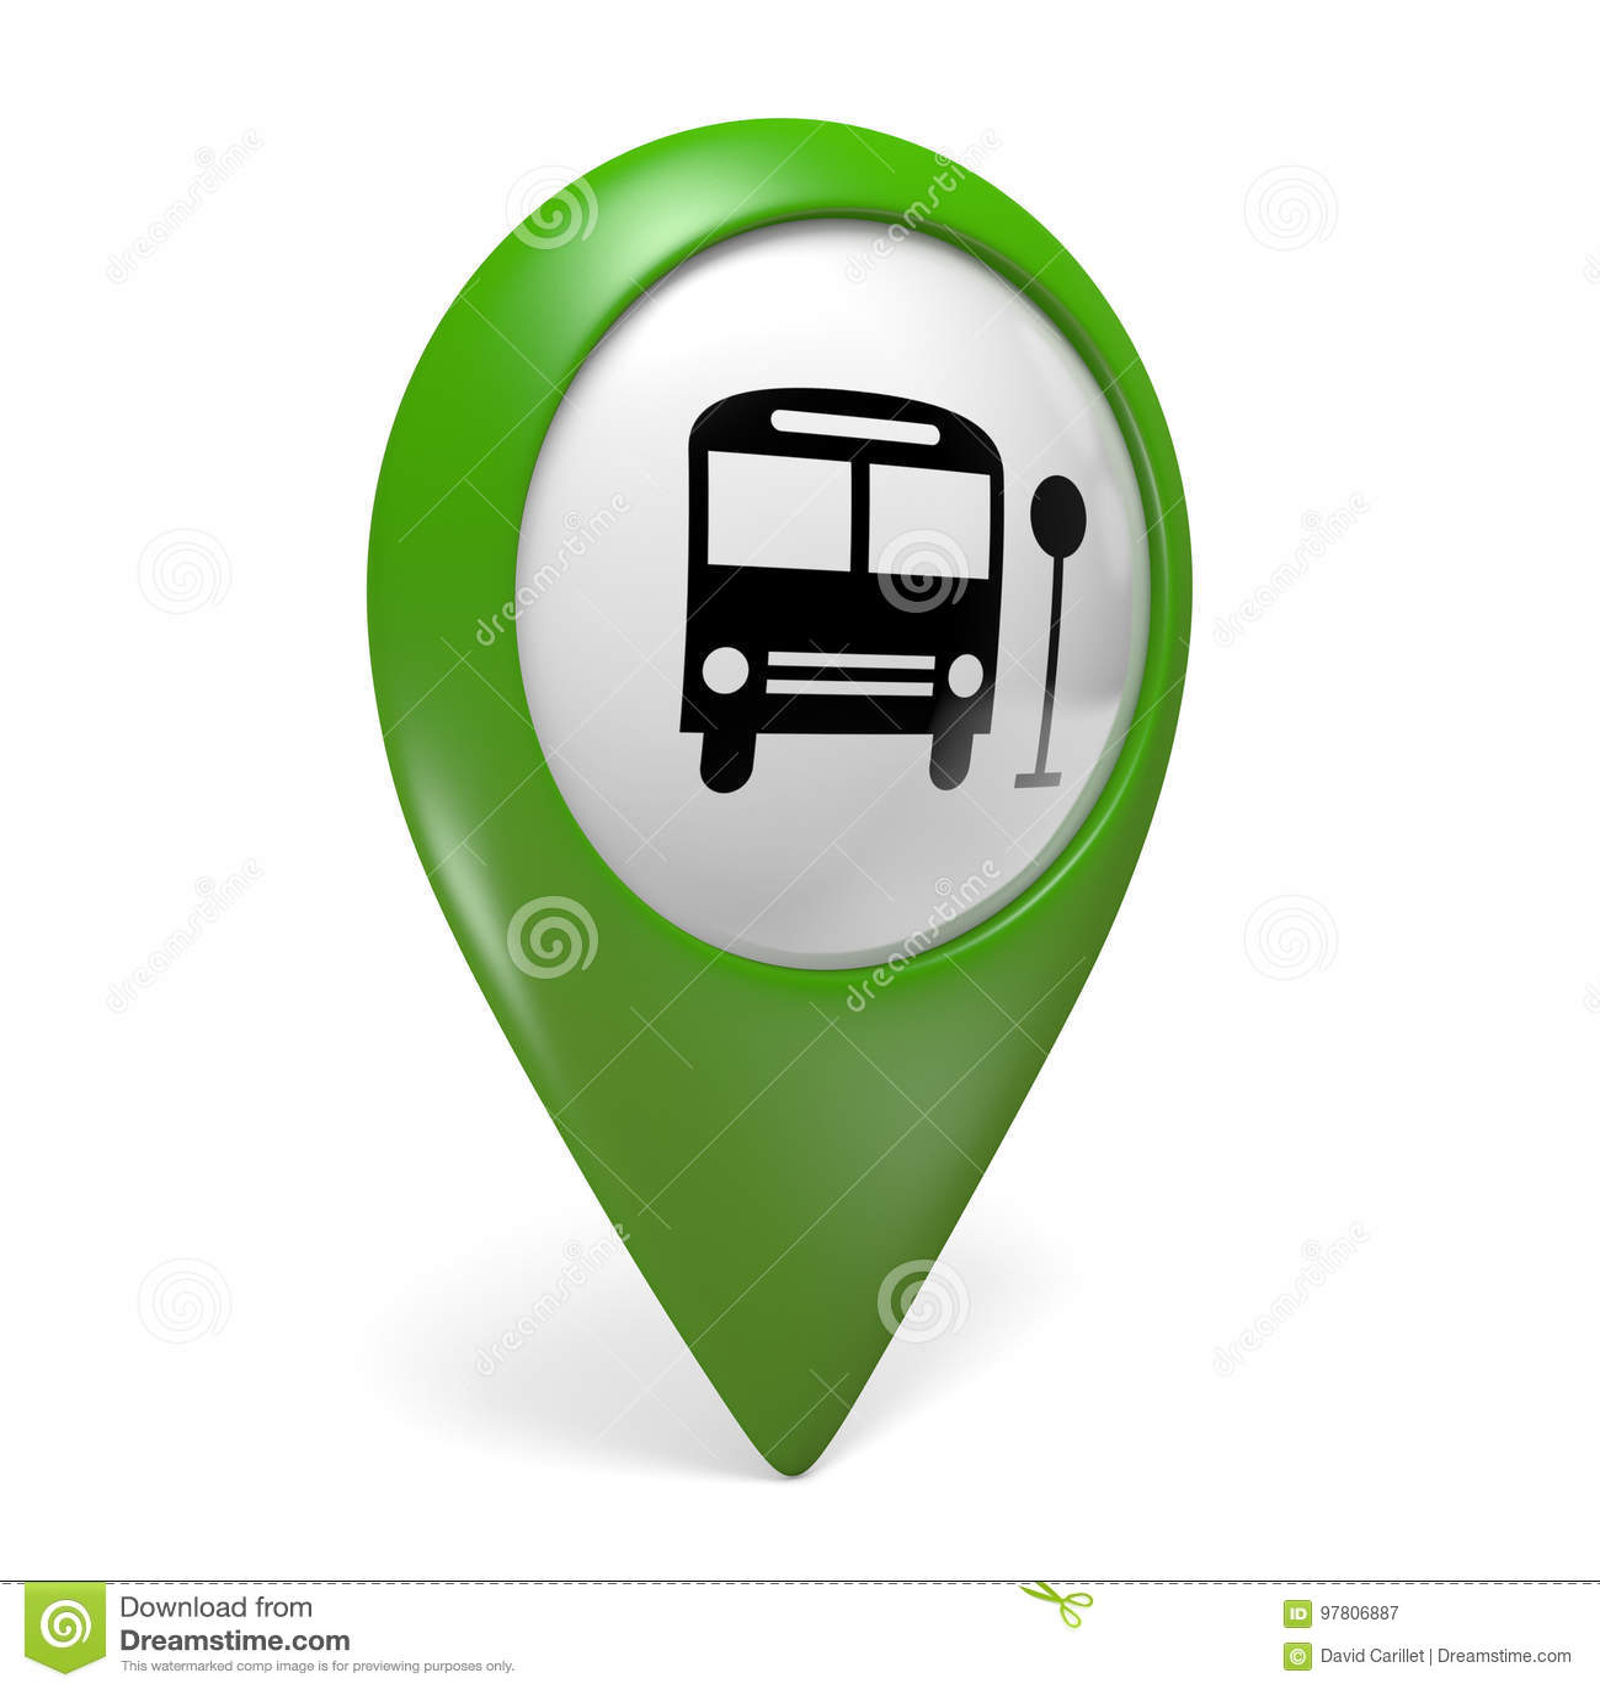 Green Map Pointer Icon With A Bus Symbol For Public ... on mod symbols, power symbols, crane symbols, sport symbols, baltimore symbols, cd symbols, race symbols, state symbols, real symbols, cook symbols,